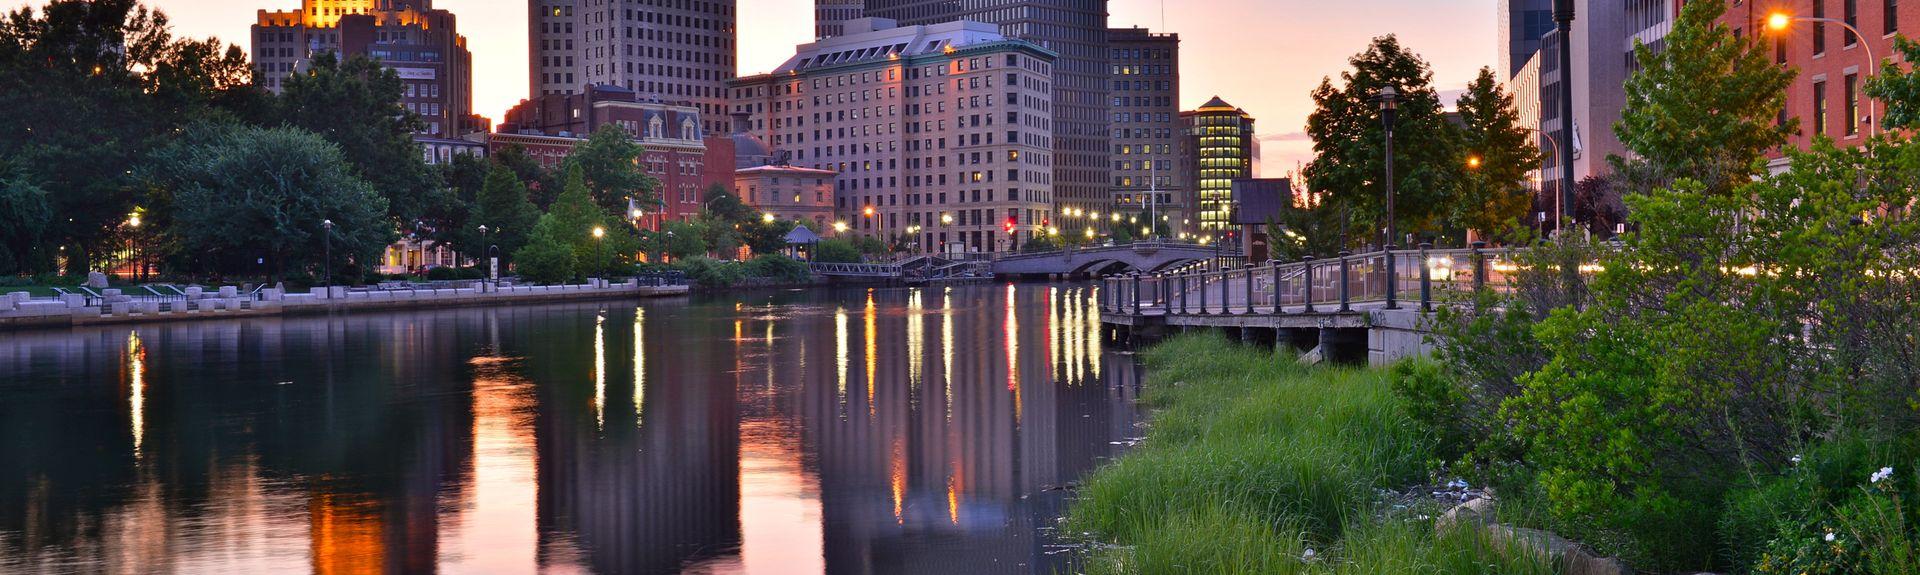 Providence, Providence, Rhode Island, Estados Unidos